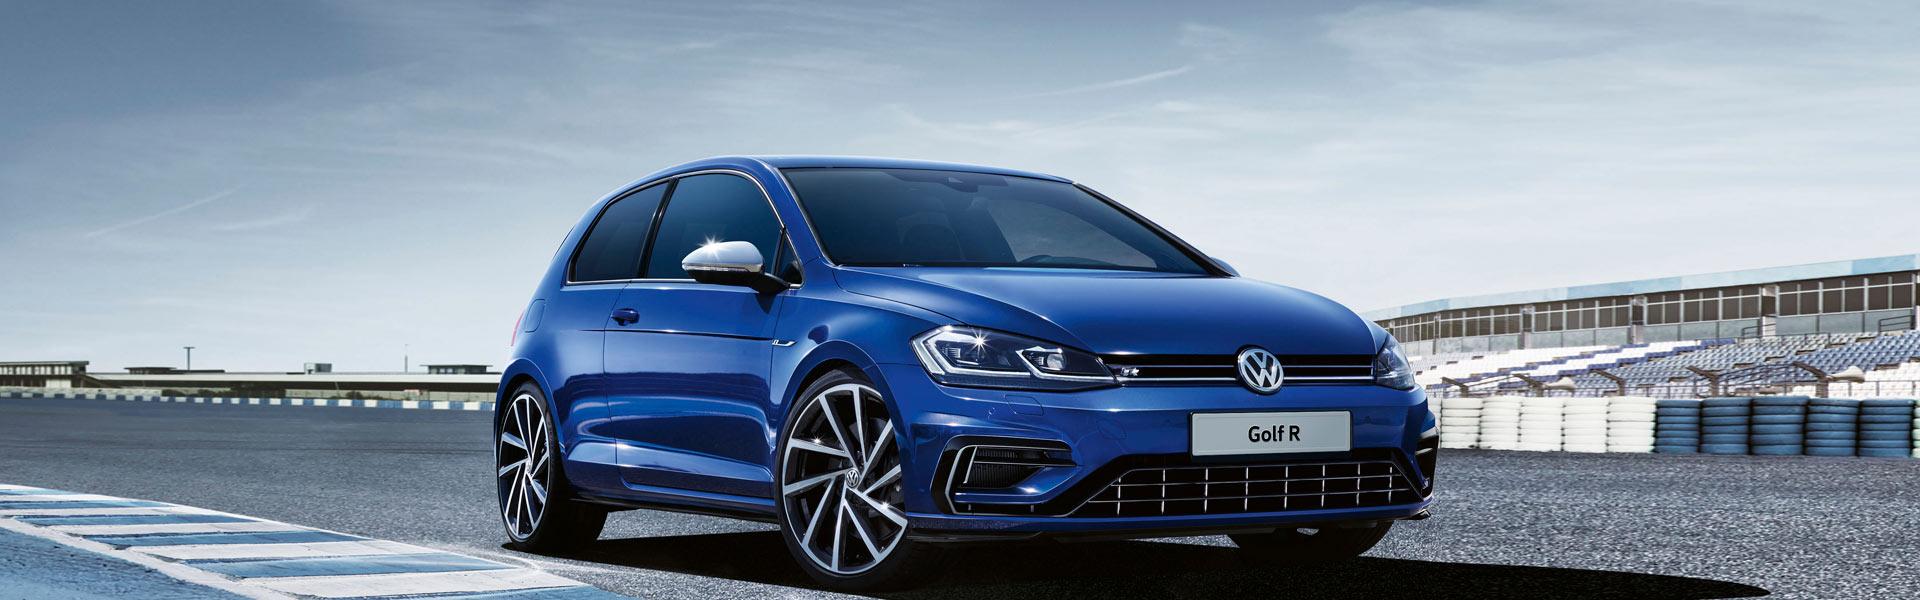 Сервис Volkswagen Golf